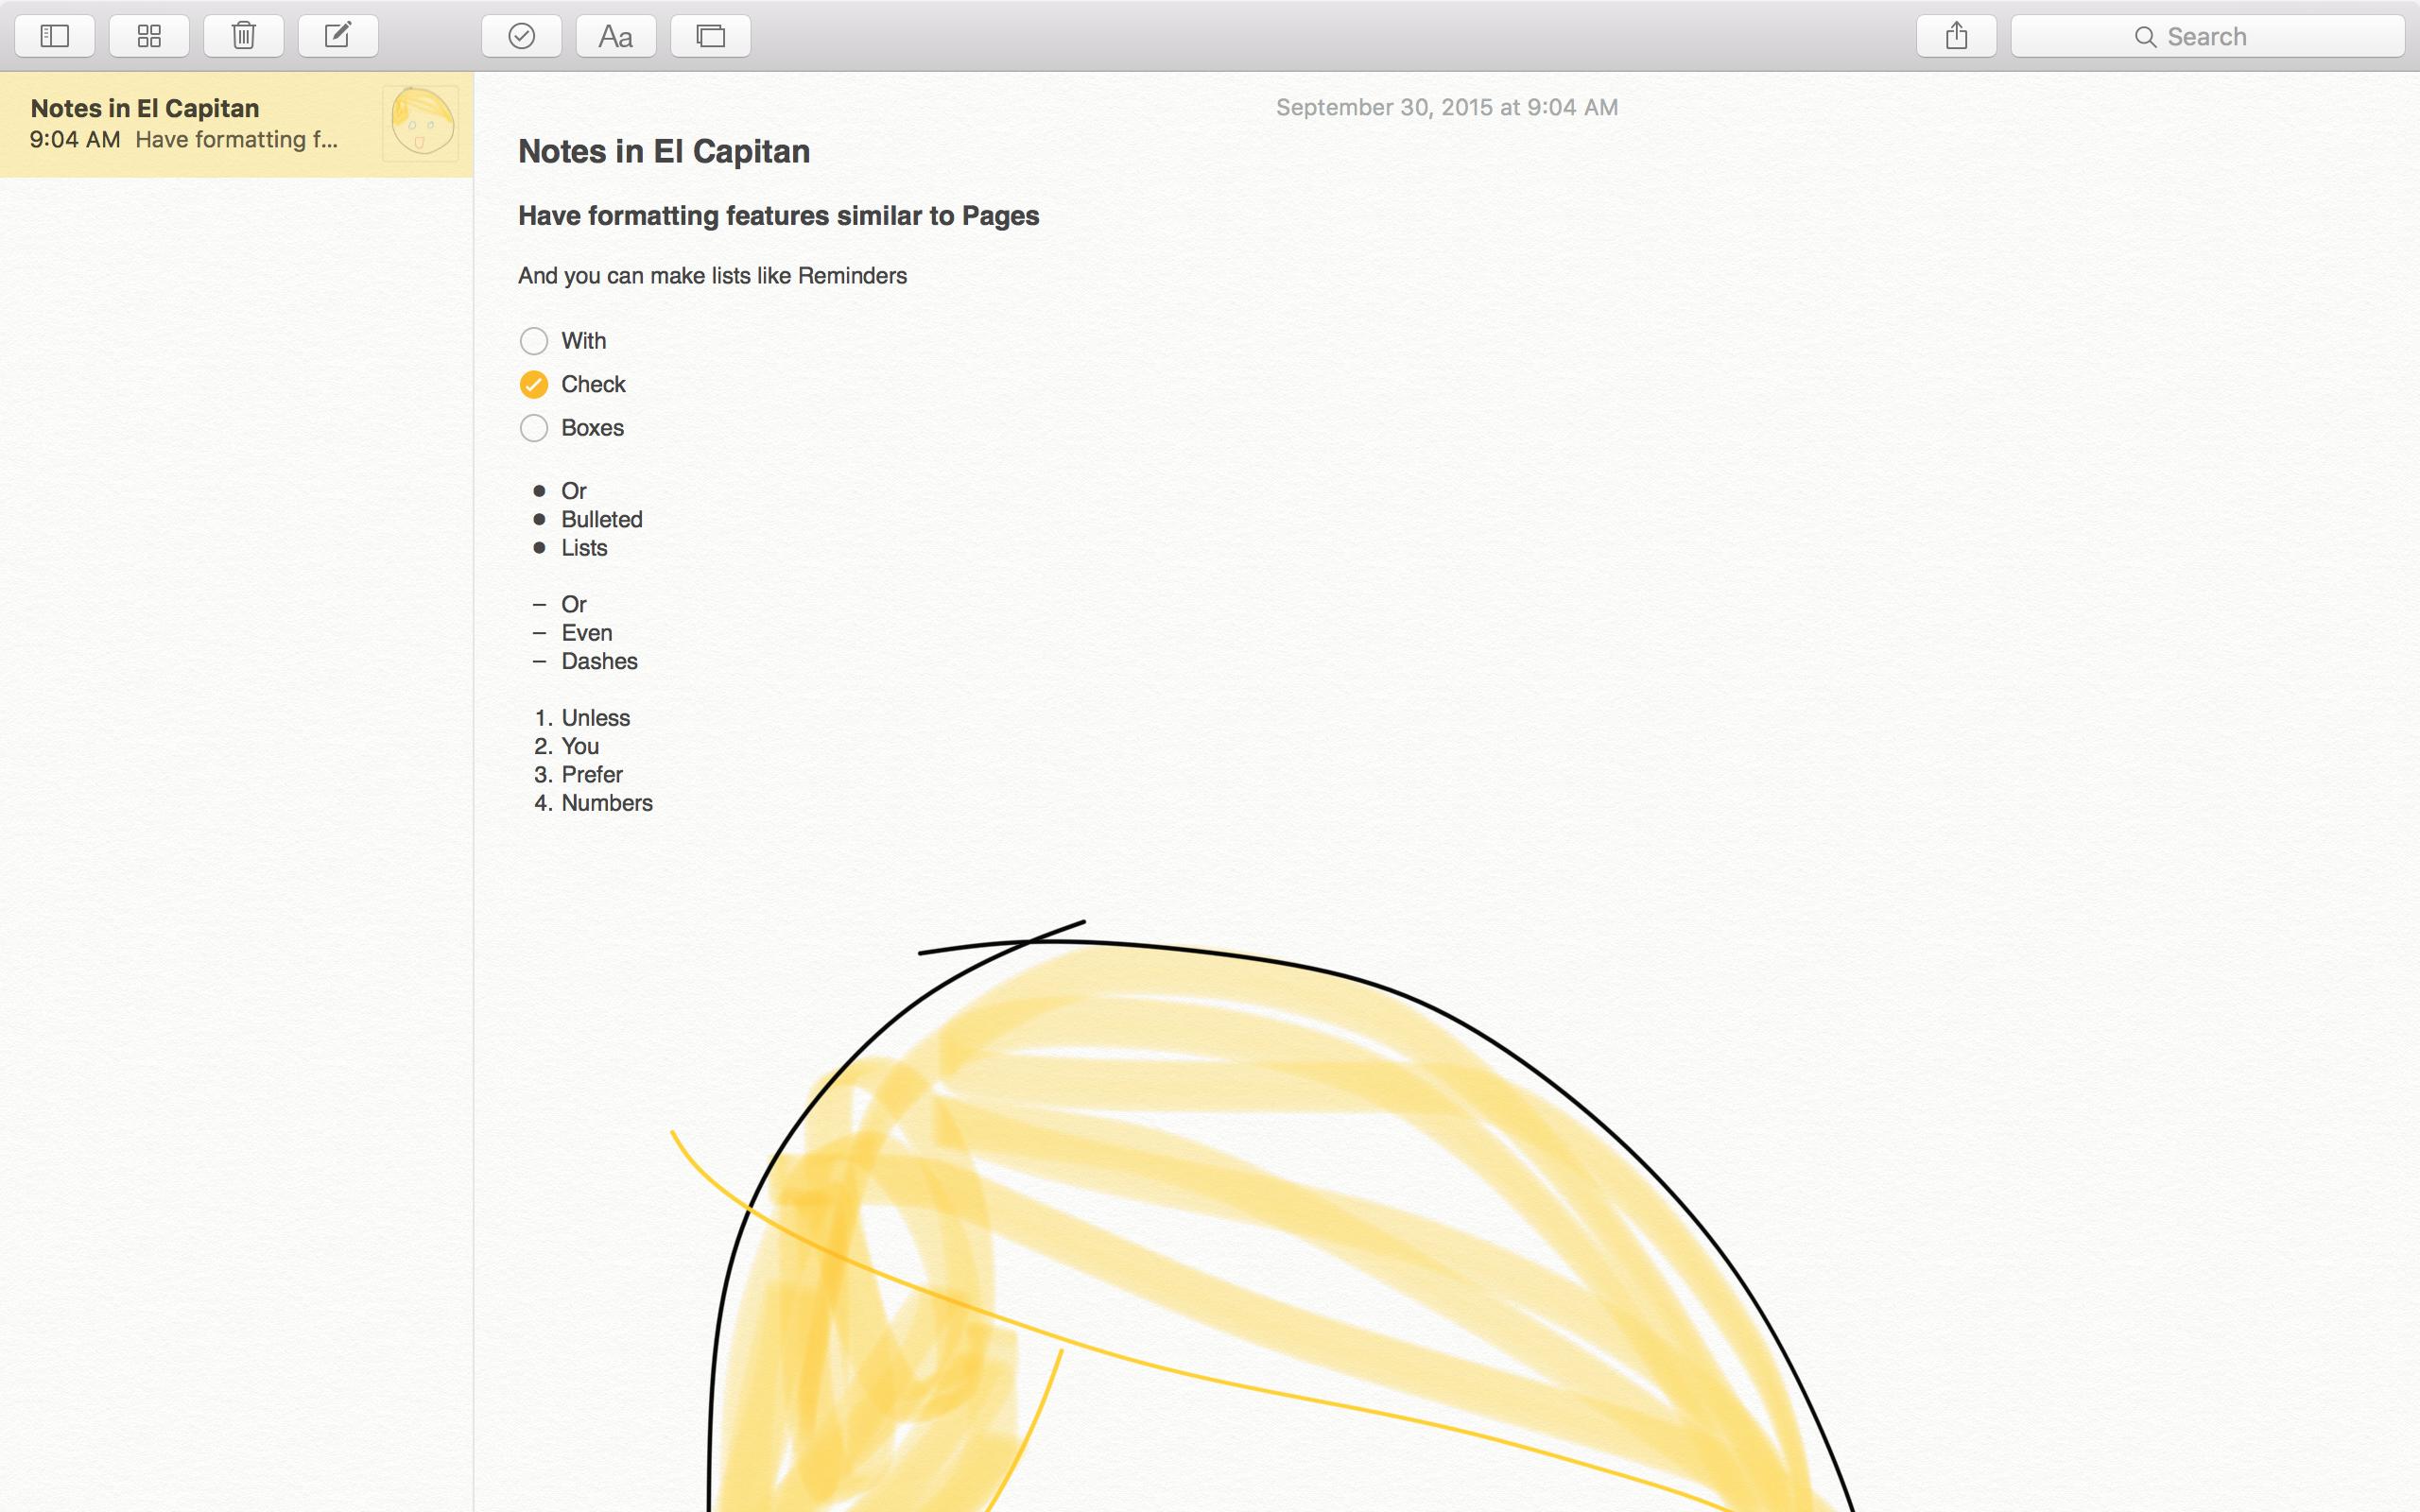 Apple releases OS X El Capitan, featuring full-screen Split View